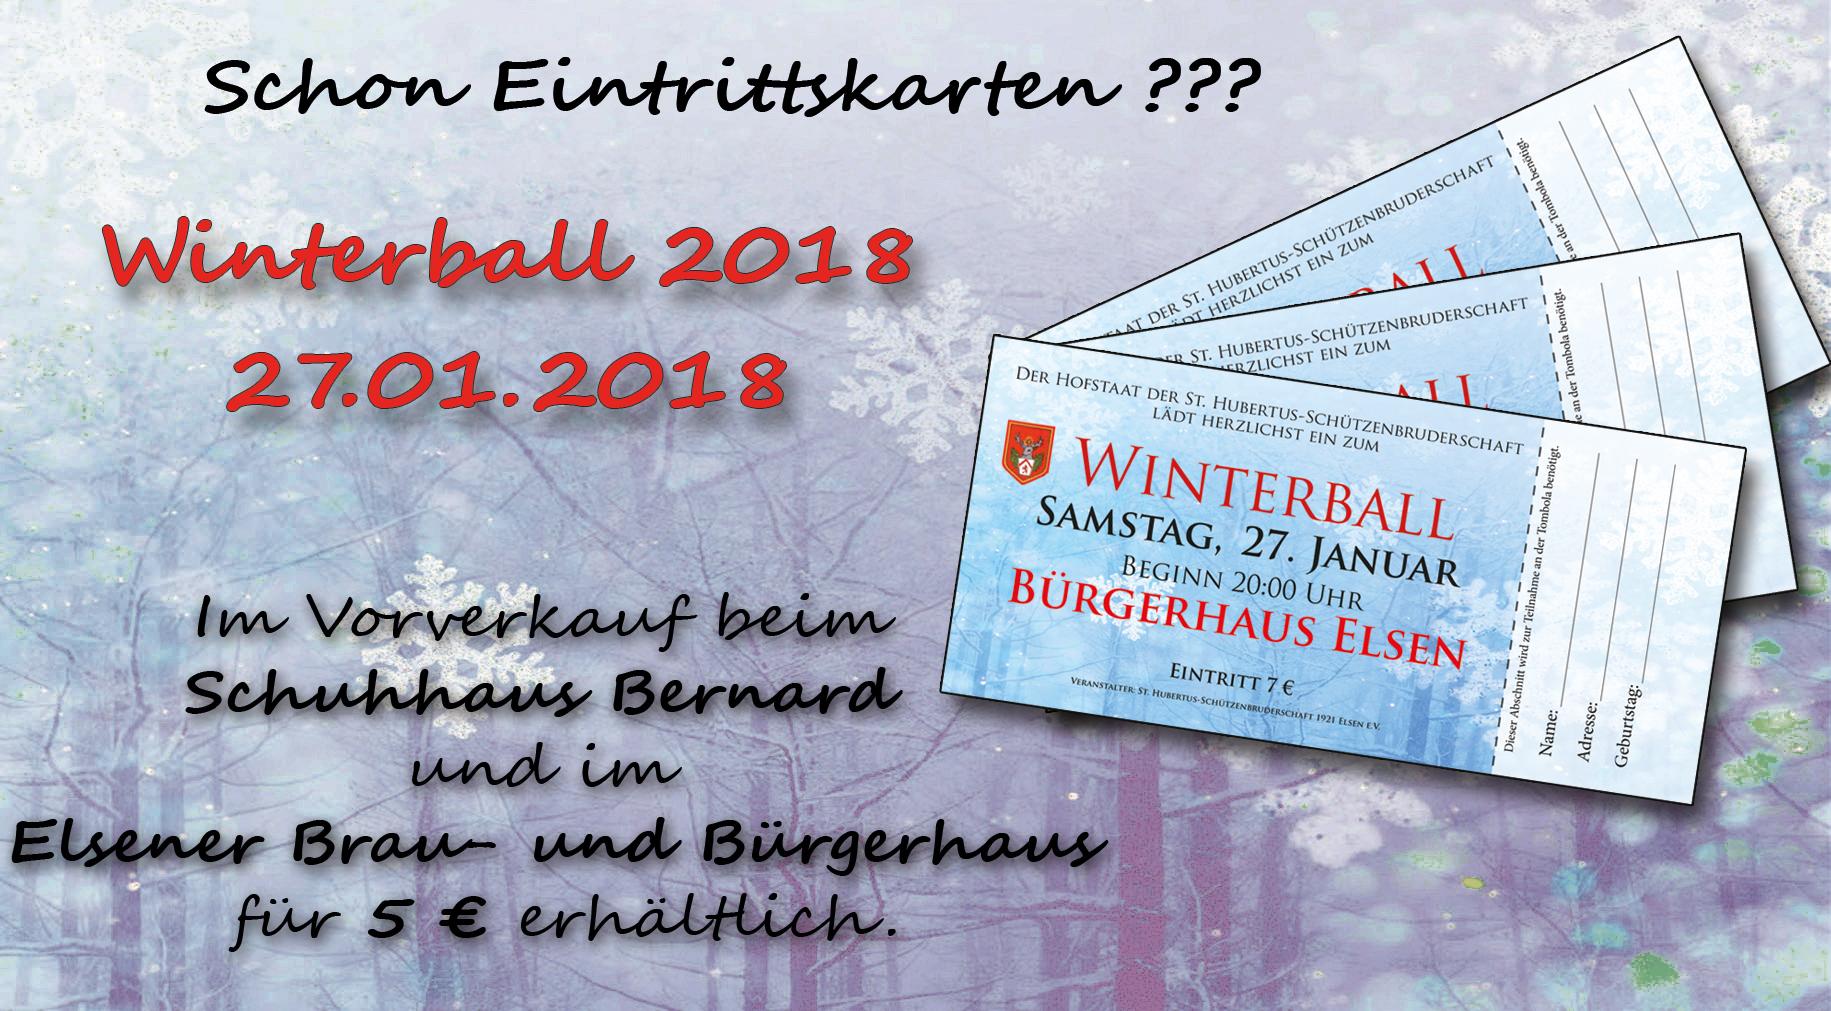 WERBUNG-FB_Eintrittskarte-Winterball-2018_2